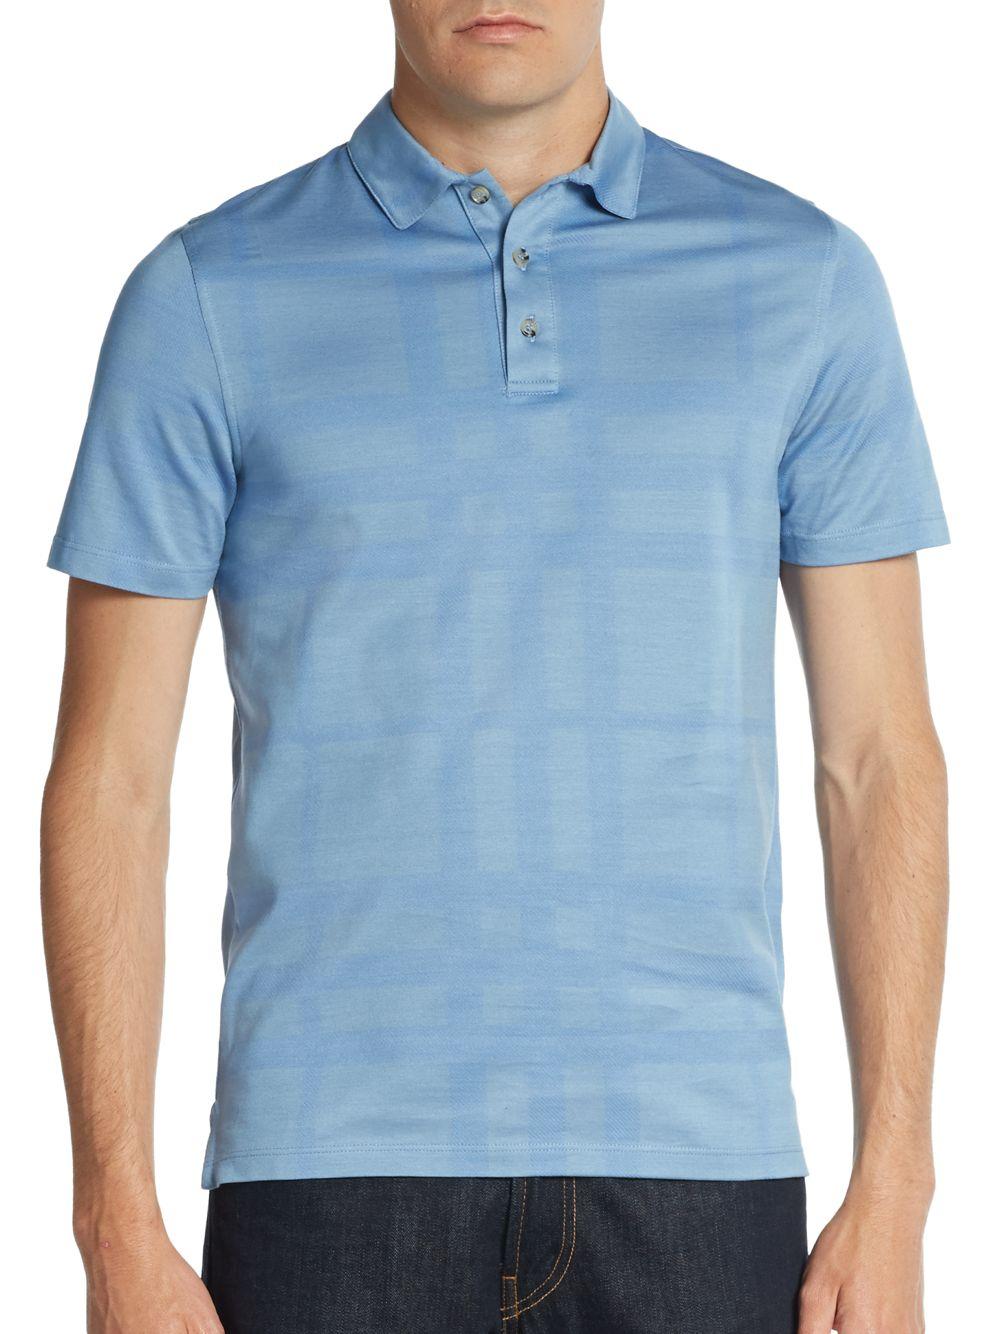 1e037344b Burberry Auden Check Cotton Polo Shirt in Blue for Men - Lyst